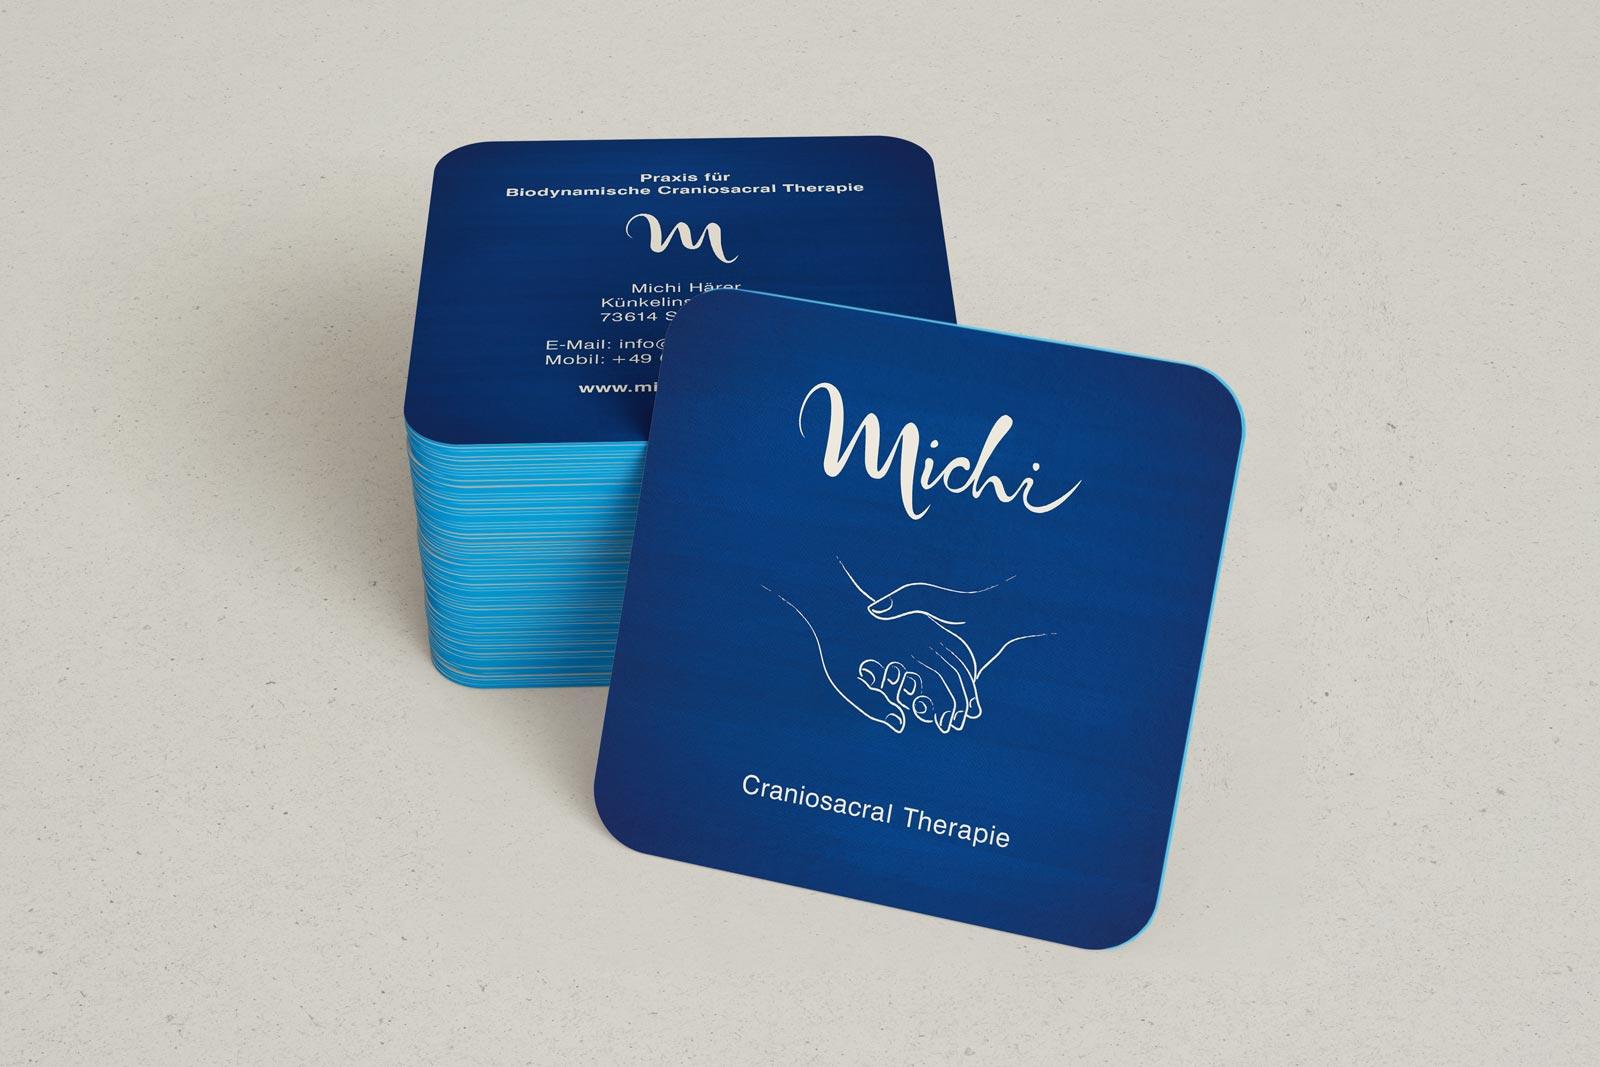 Michi, Craniosacral Therapie, Visitenkarte, Corporate Design, Vorderseite, Stapel